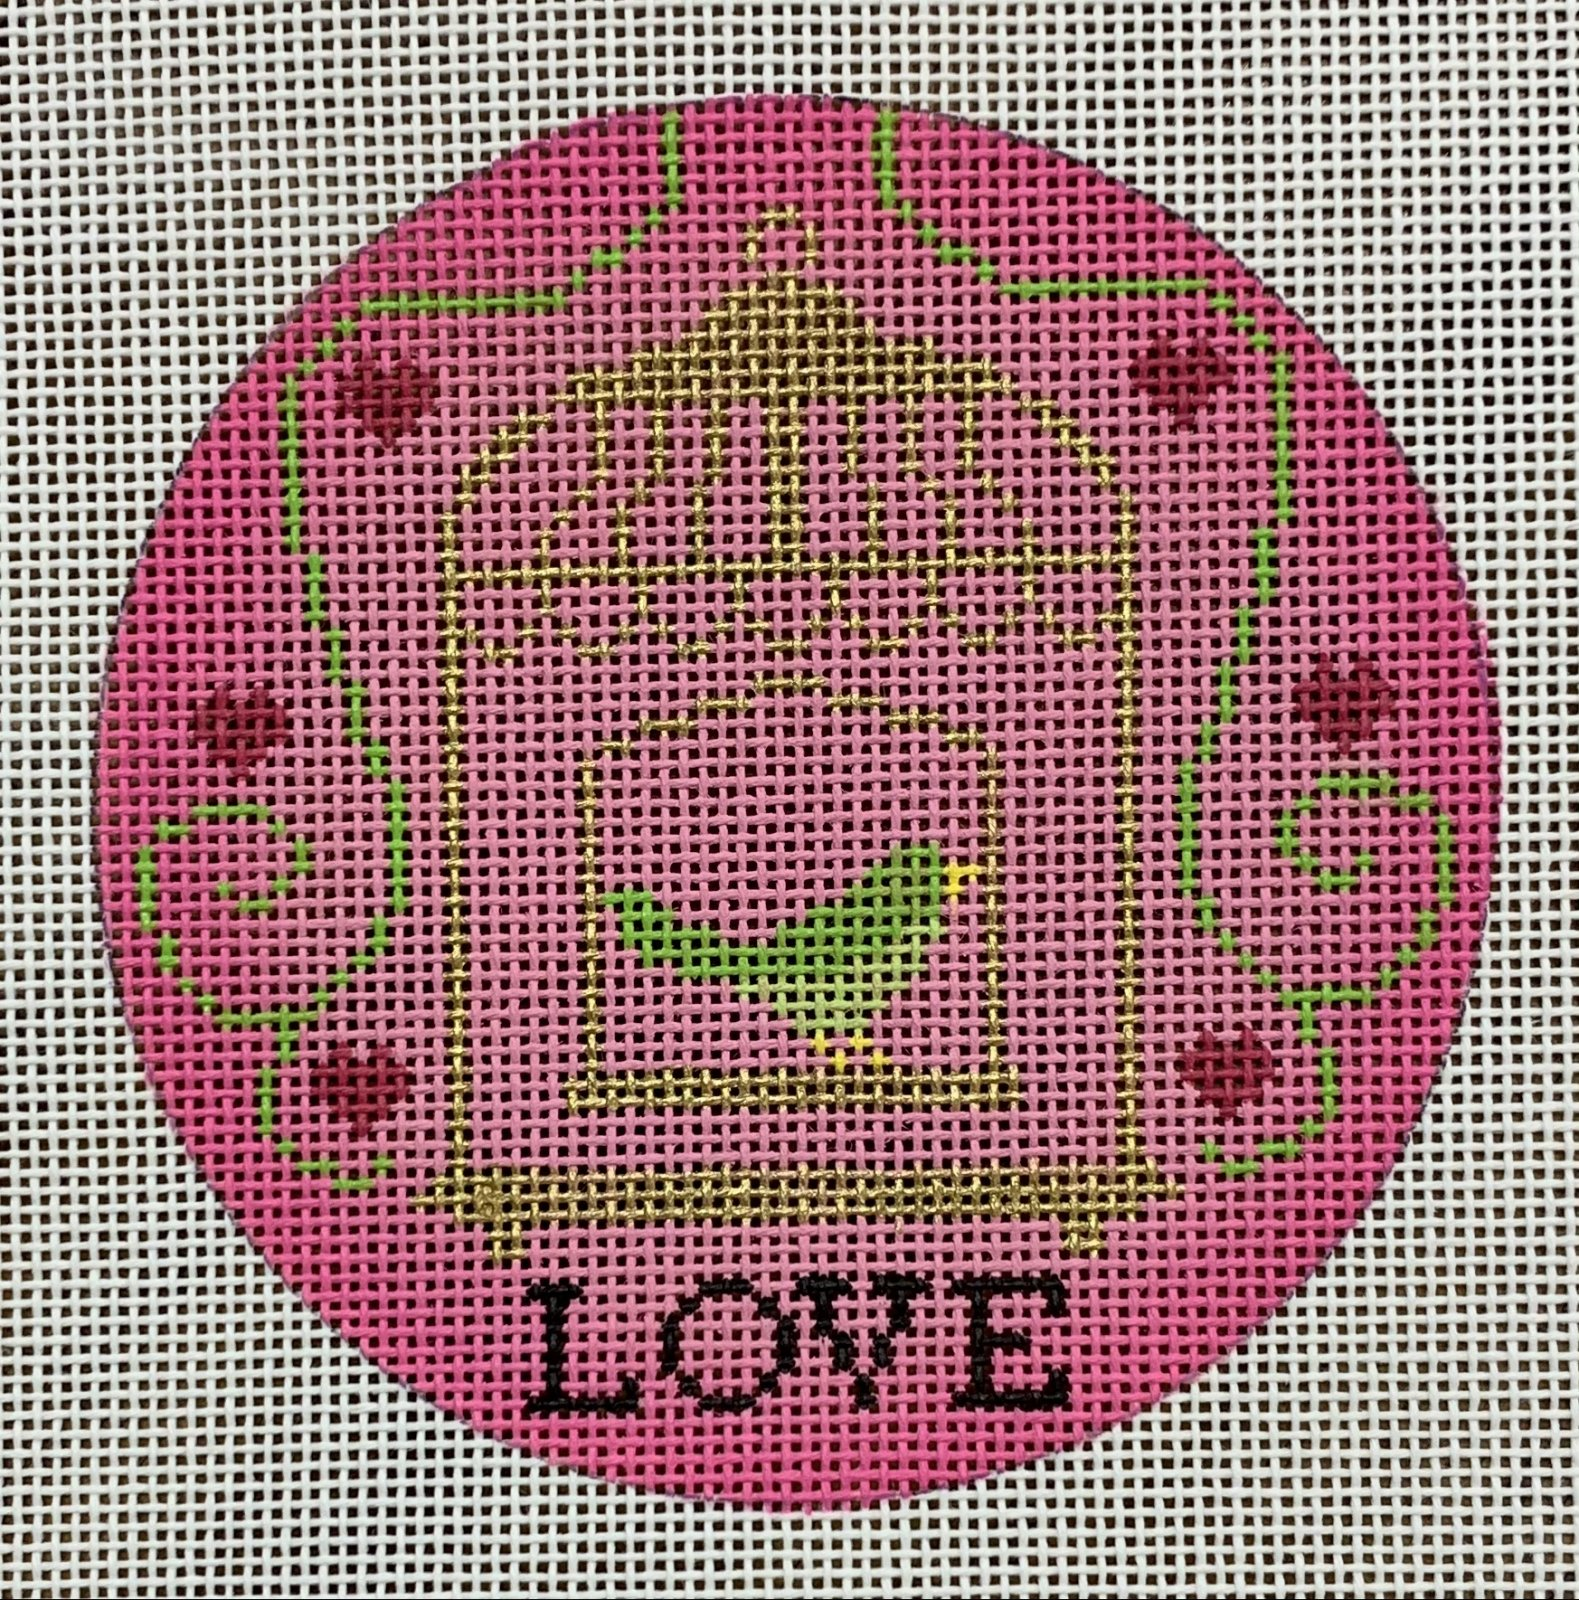 Spring Sentiments - Love